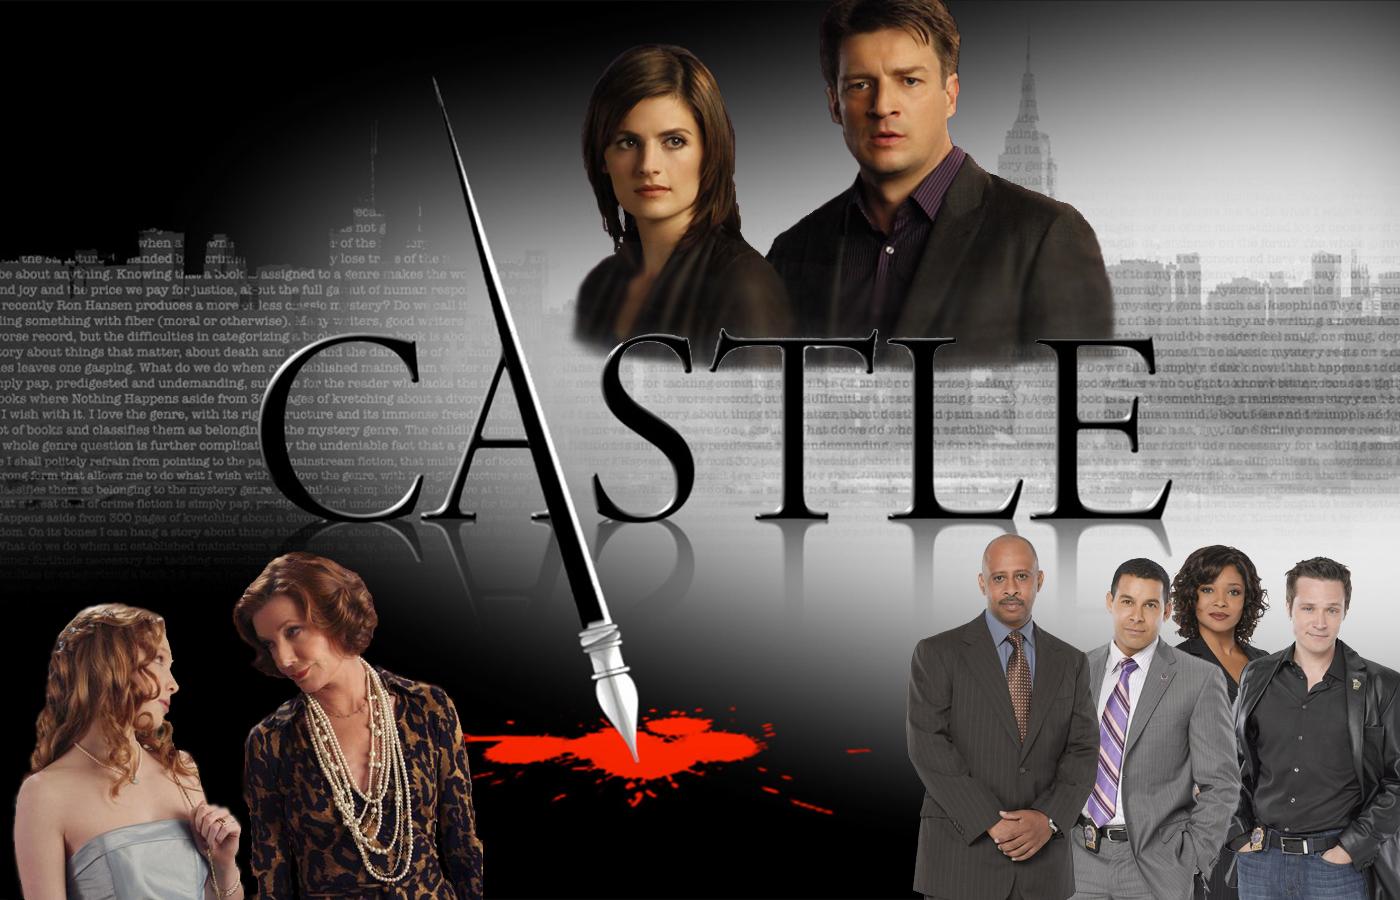 Watch Castle Season 1 Episode 1 Flowers For Your Grave